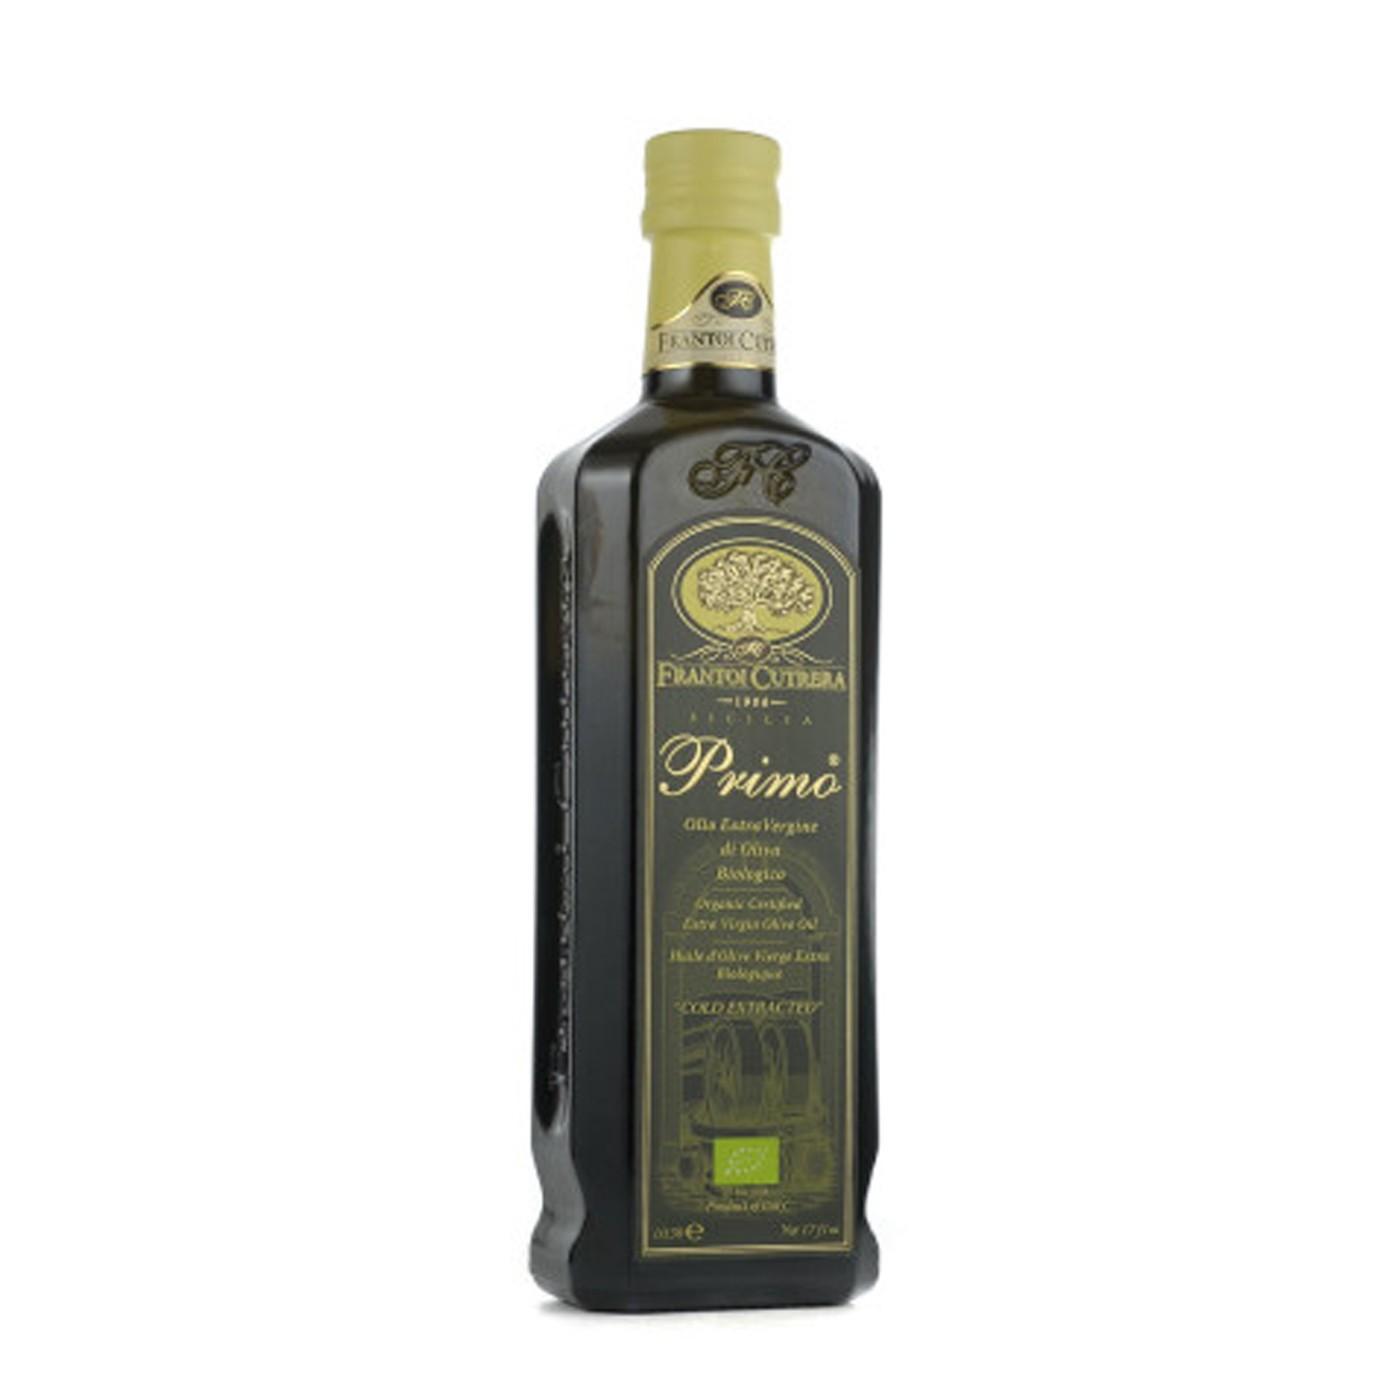 Organic Primo Sicilia Extra Virgin Olive Oil 16.9 oz